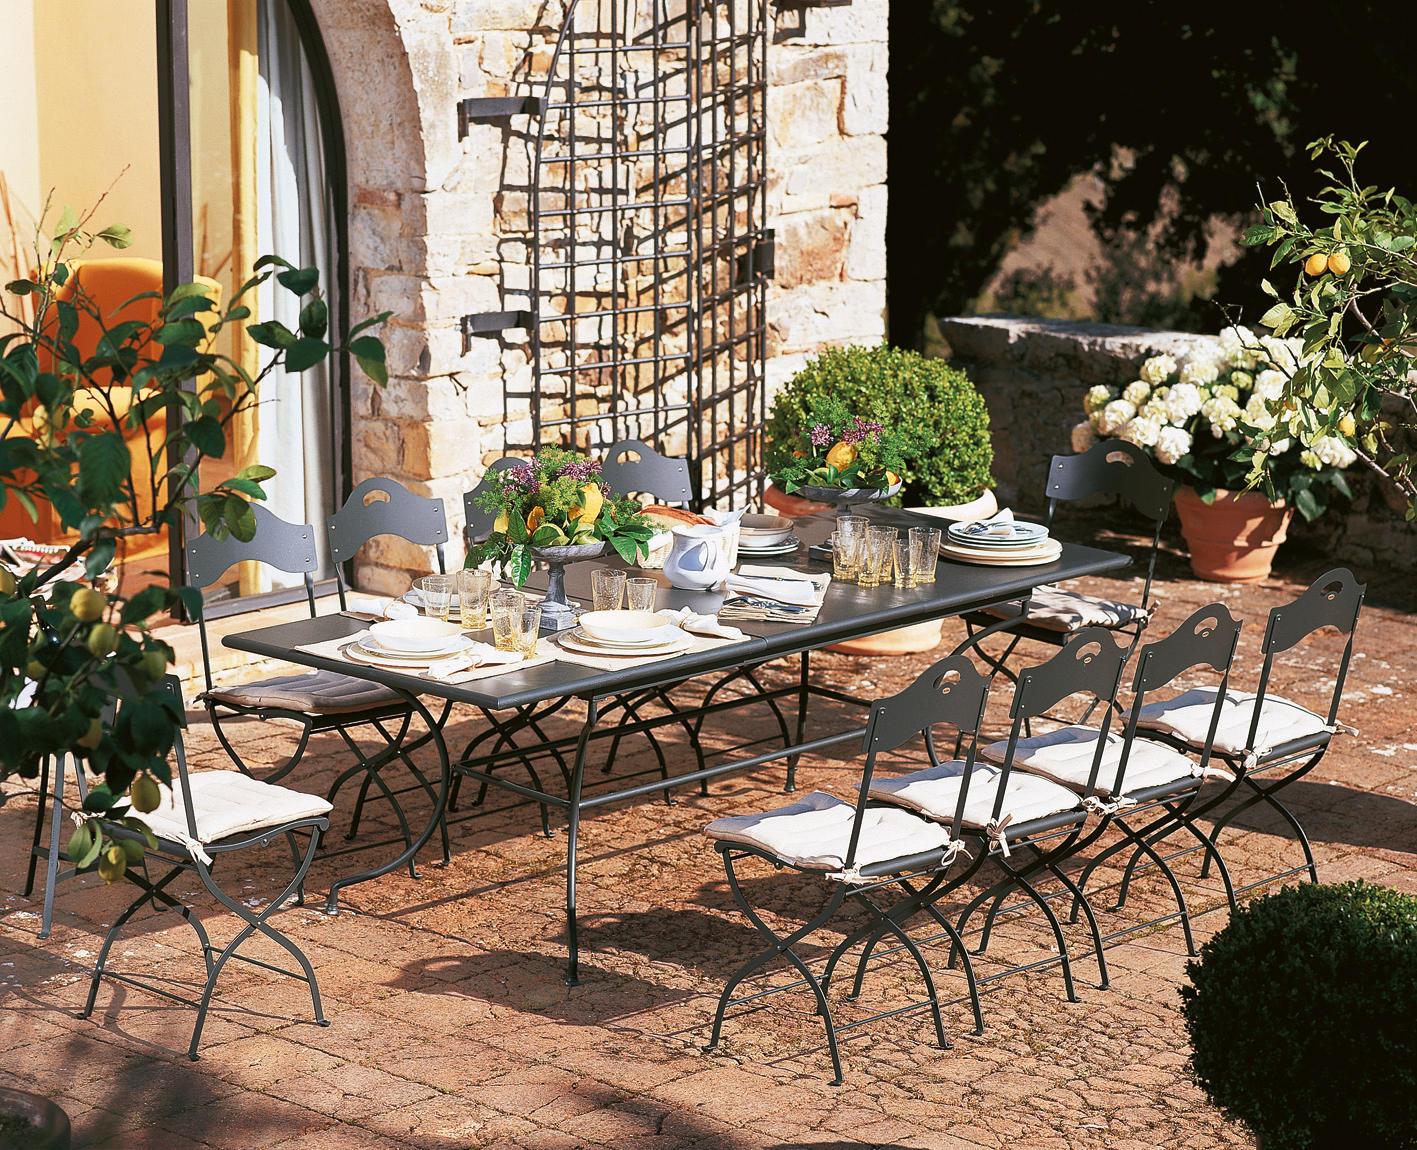 D coration table jardin unopiu 87 boulogne billancourt for Jardin 87